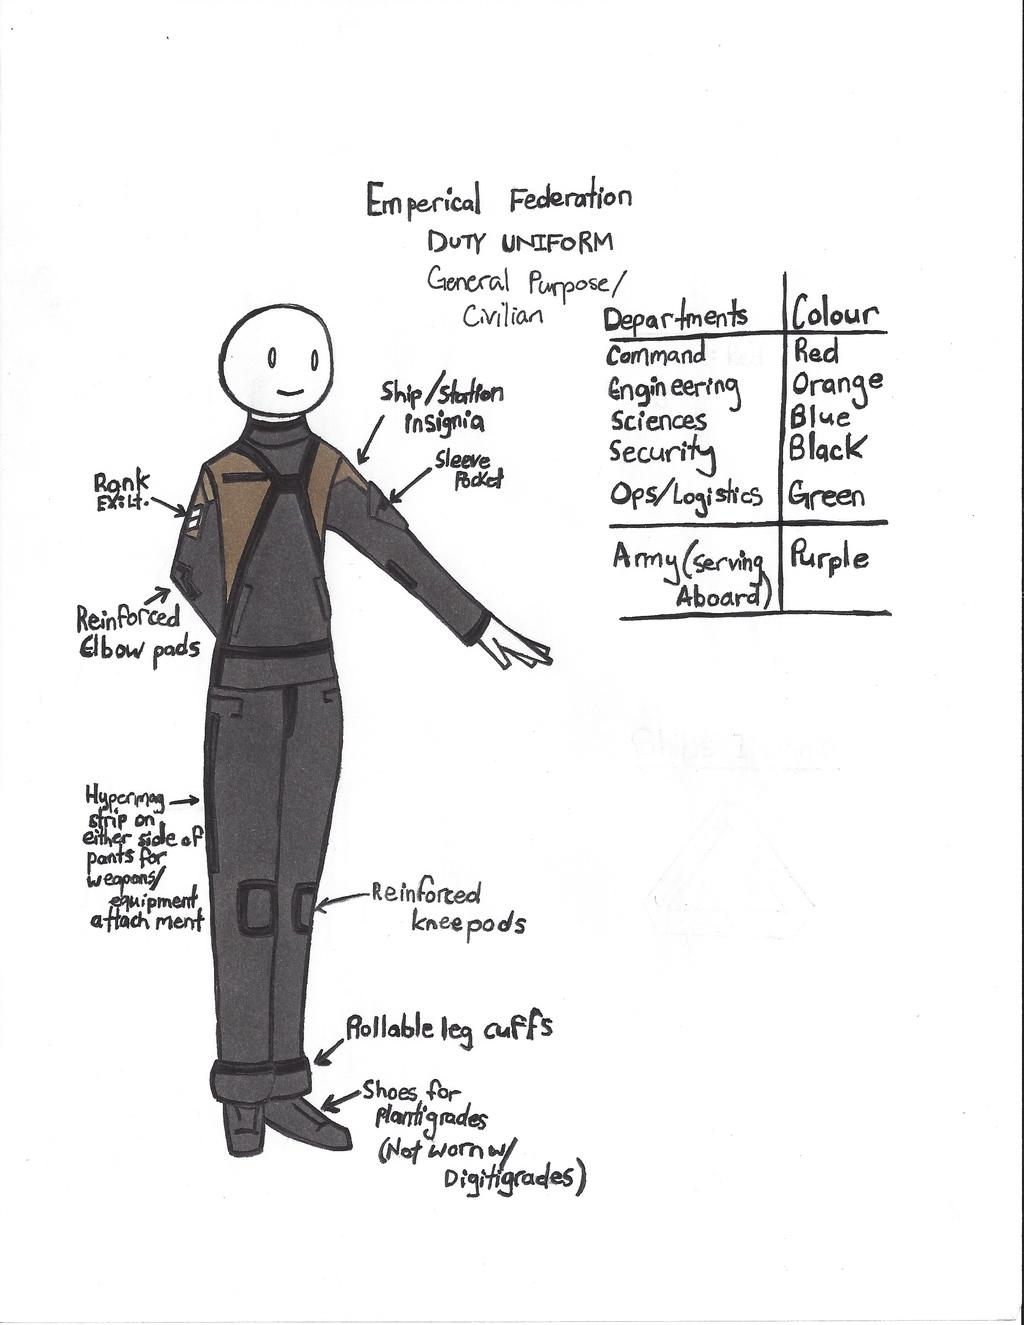 New Empirical Federation Navy Uniform